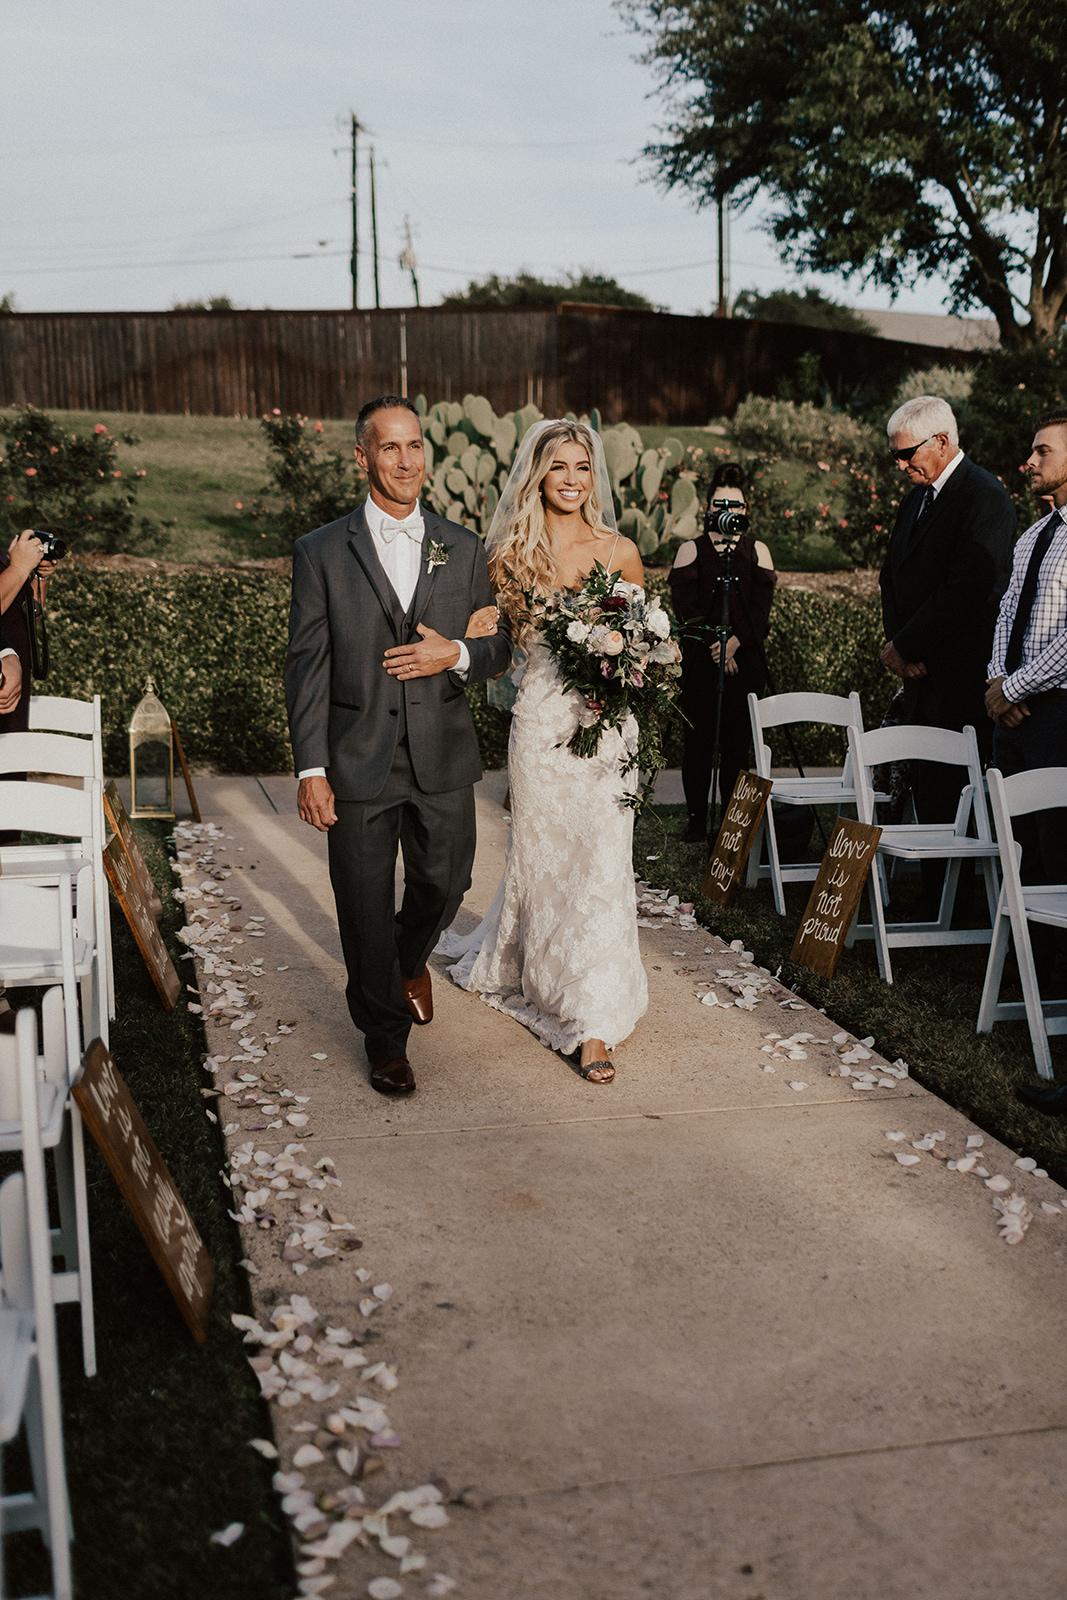 allie-tyler-vintage-villas-austin-texas-wedding-photographer-2255.jpg